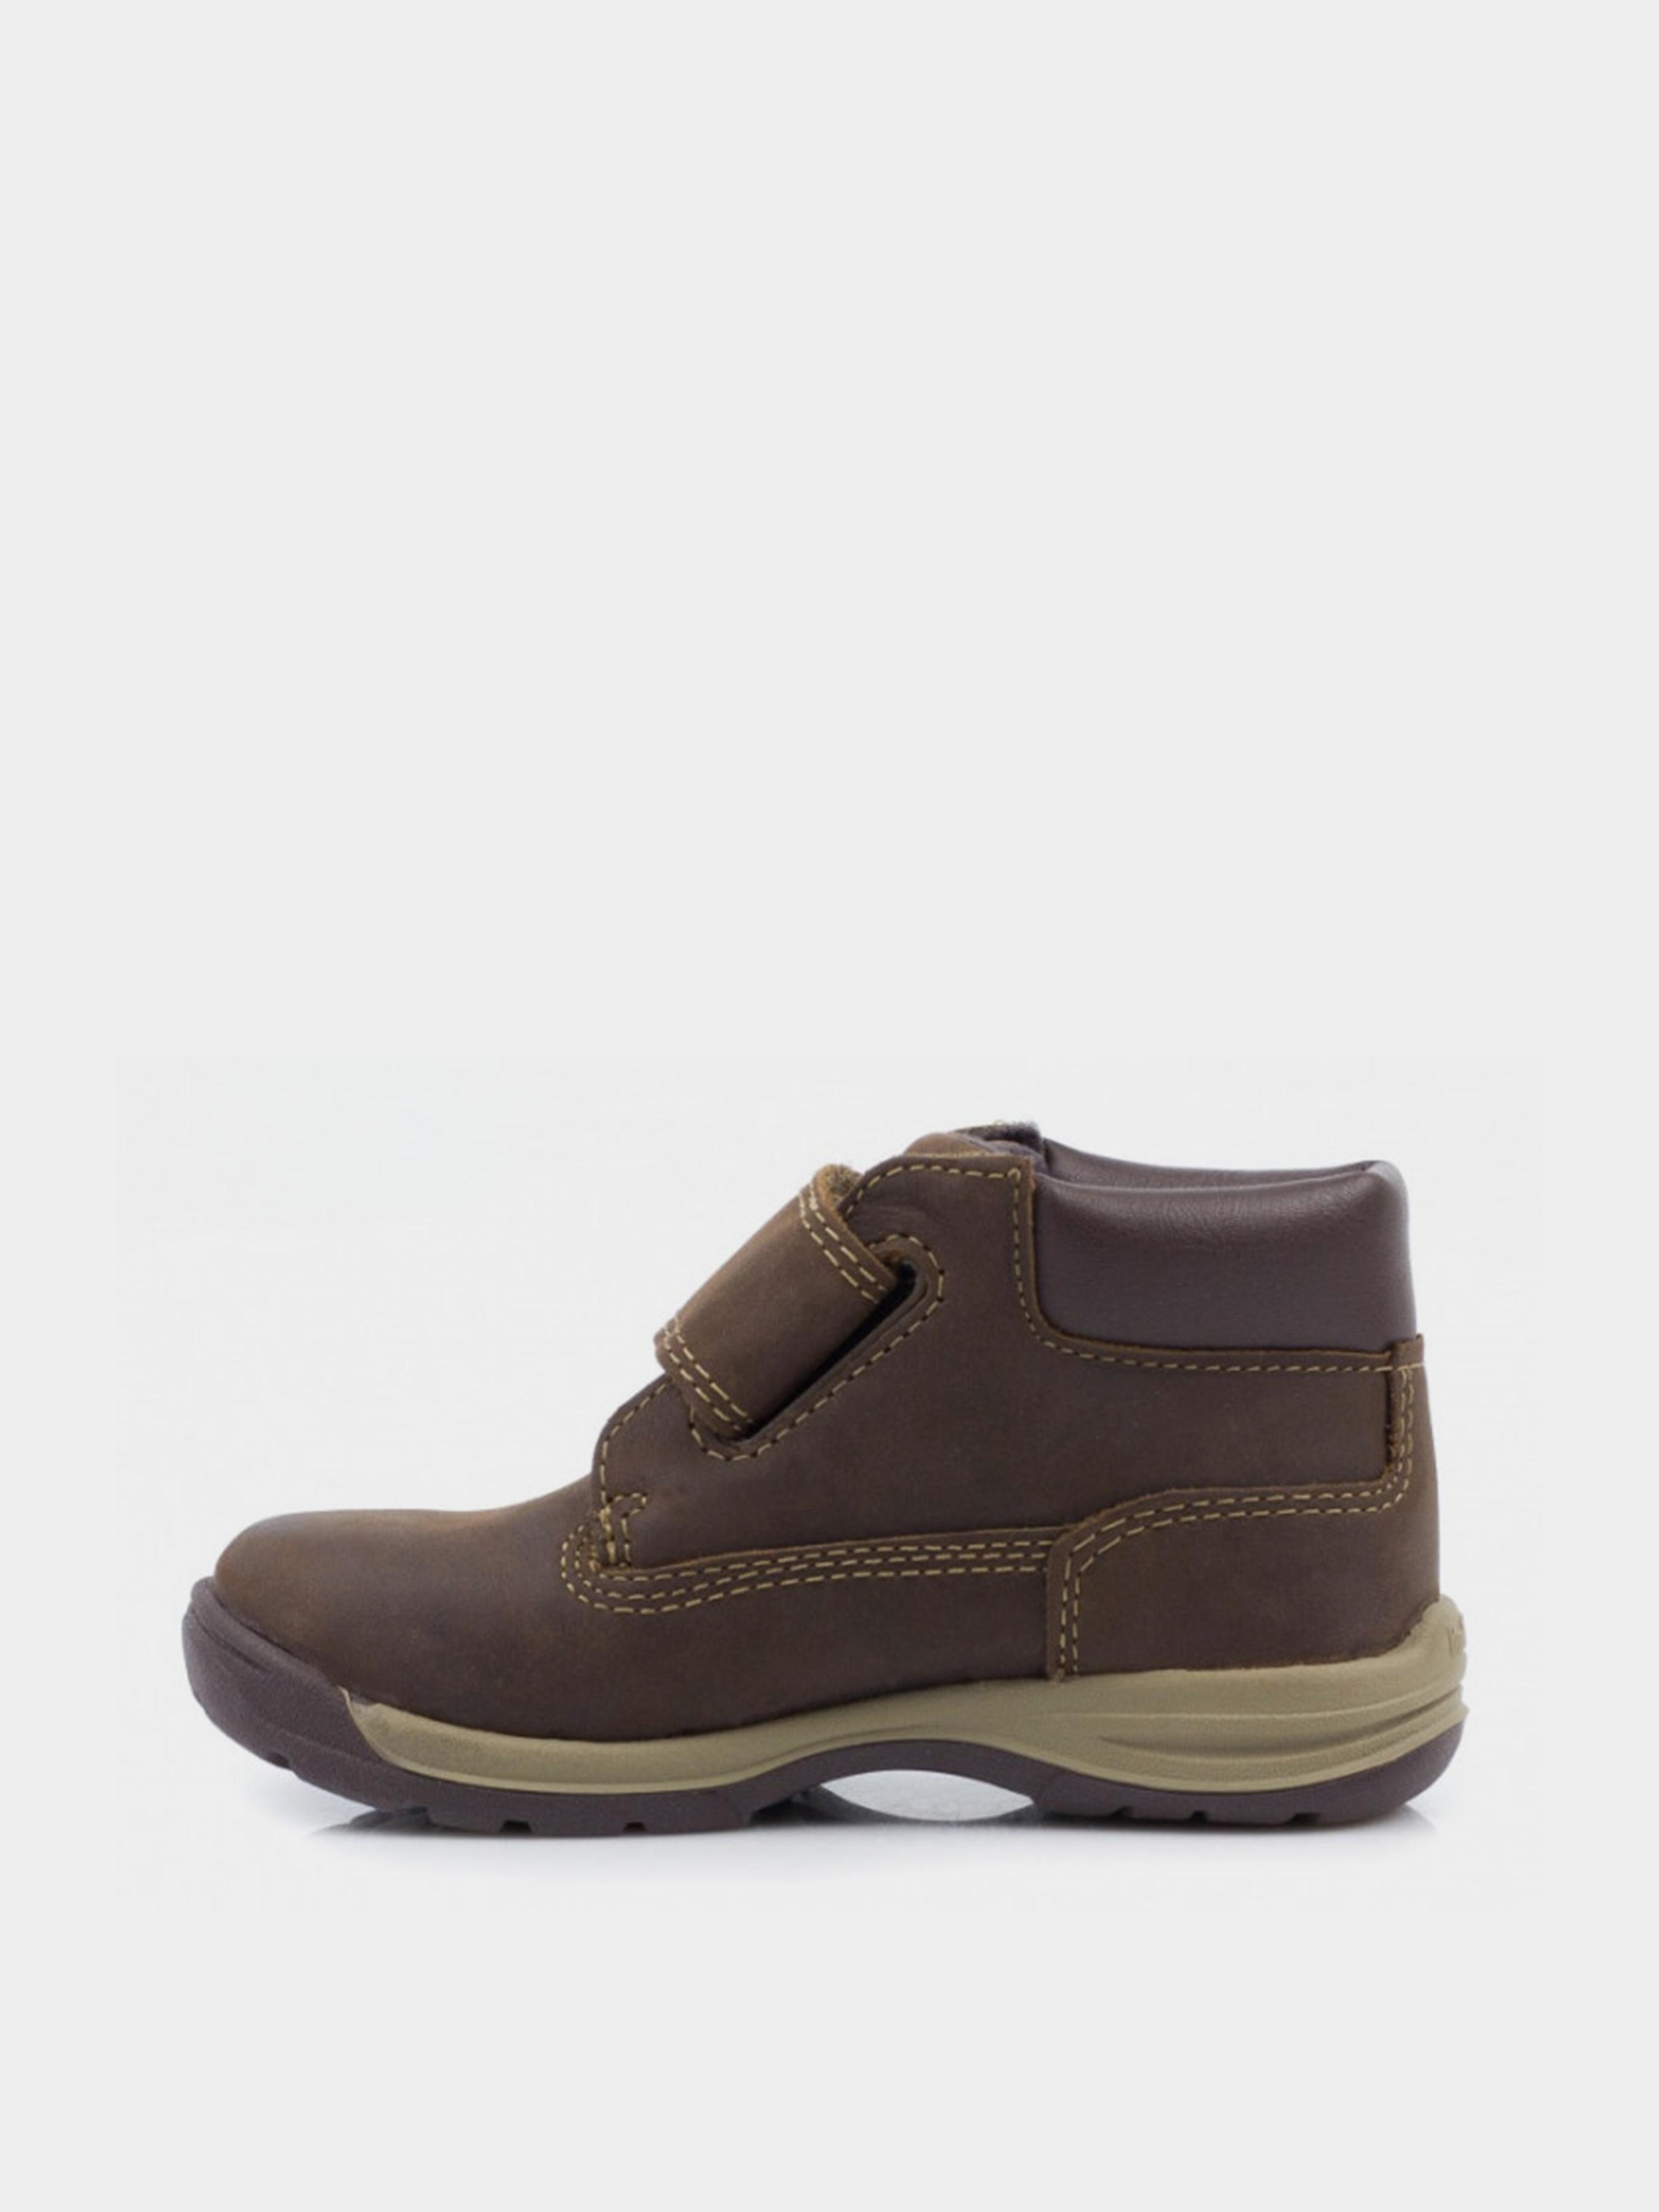 Ботинки для детей Timberland TIMBER TYKES TL1307 продажа, 2017